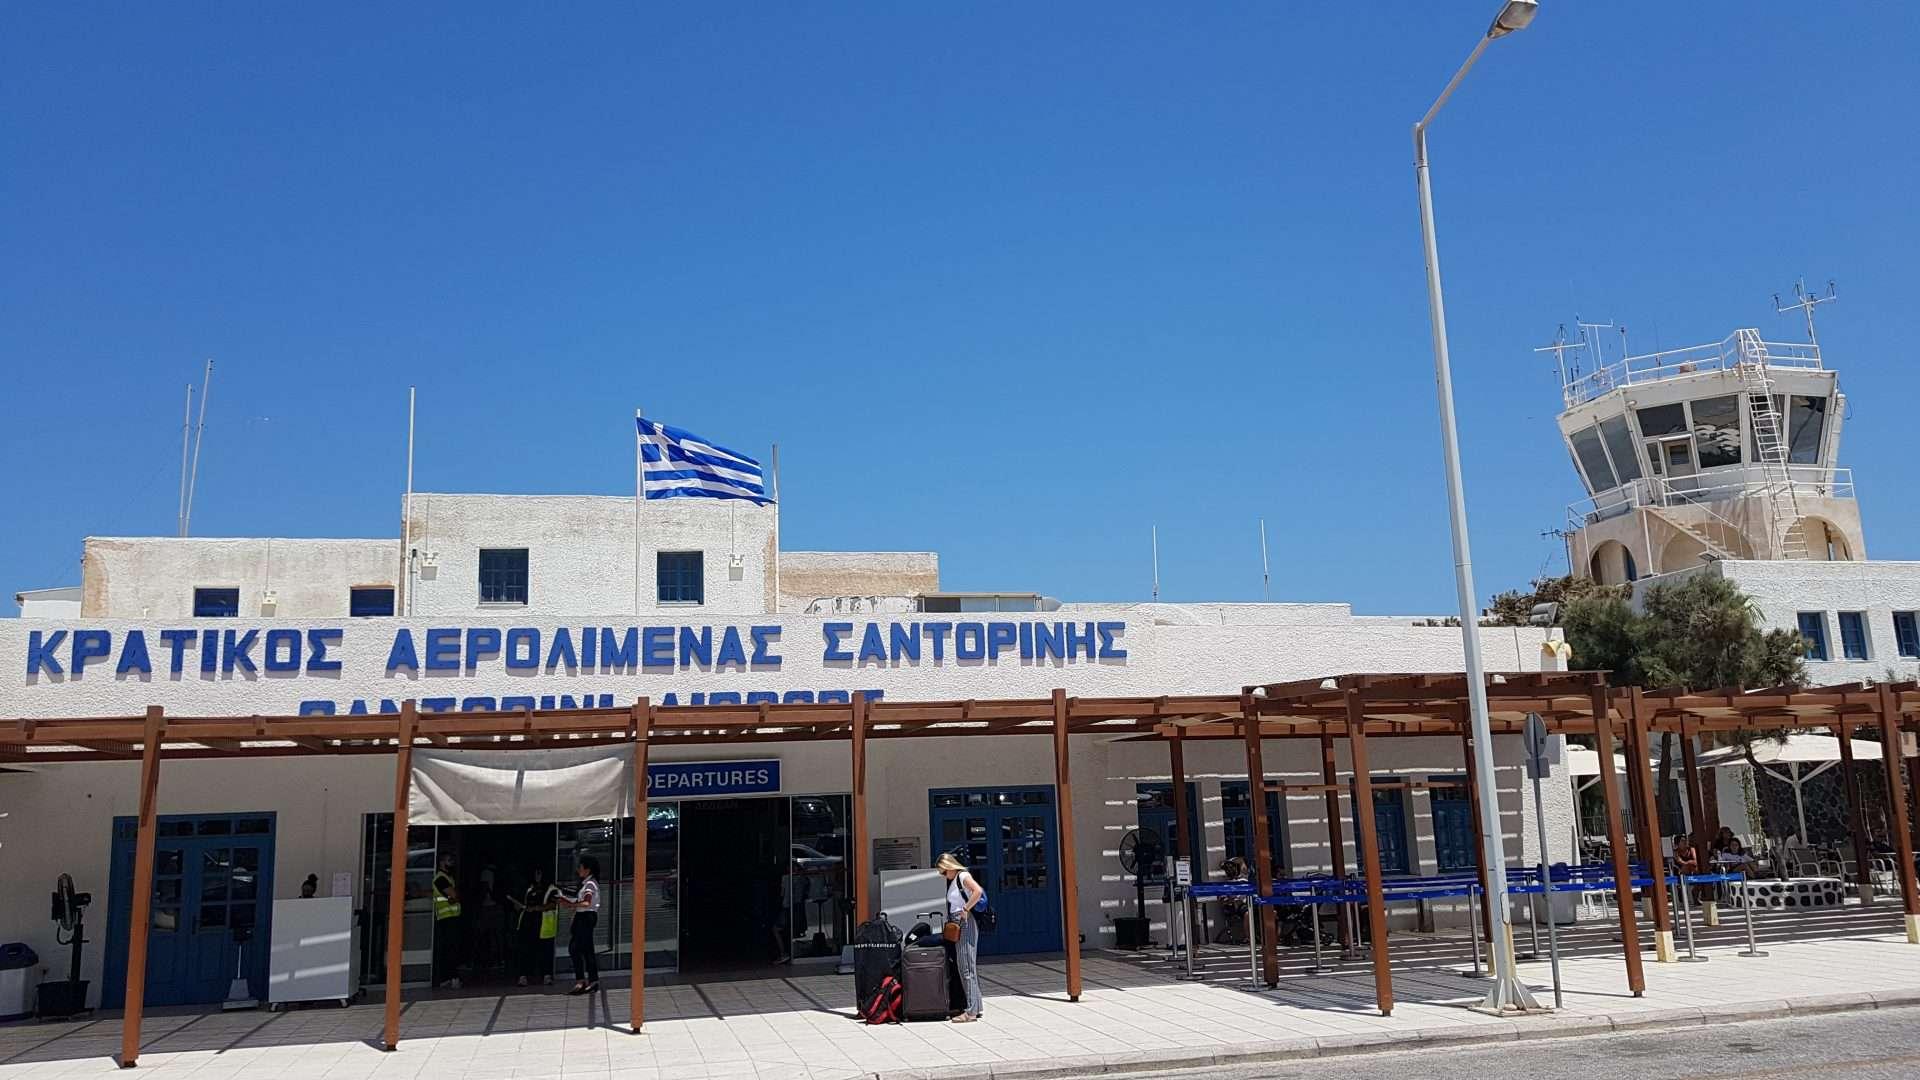 Santorini Aeroporto: Tutte le info utili